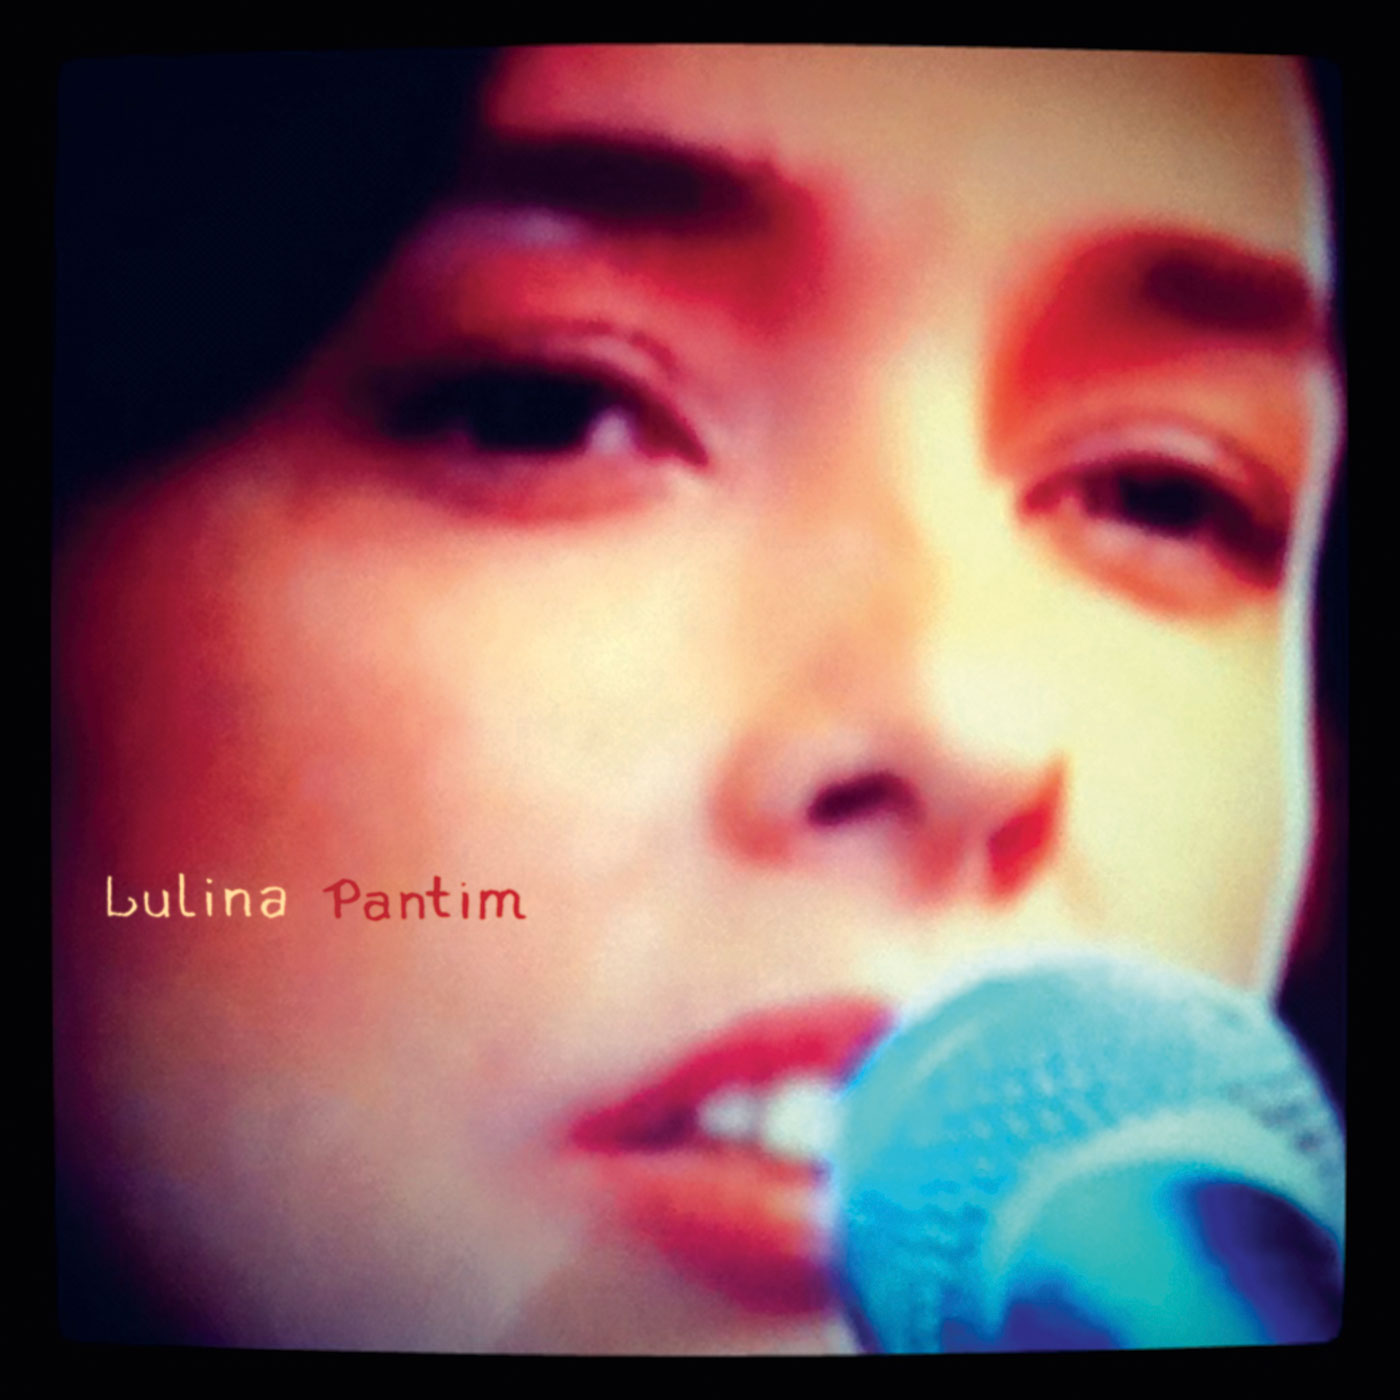 Lulina: Pantim post image